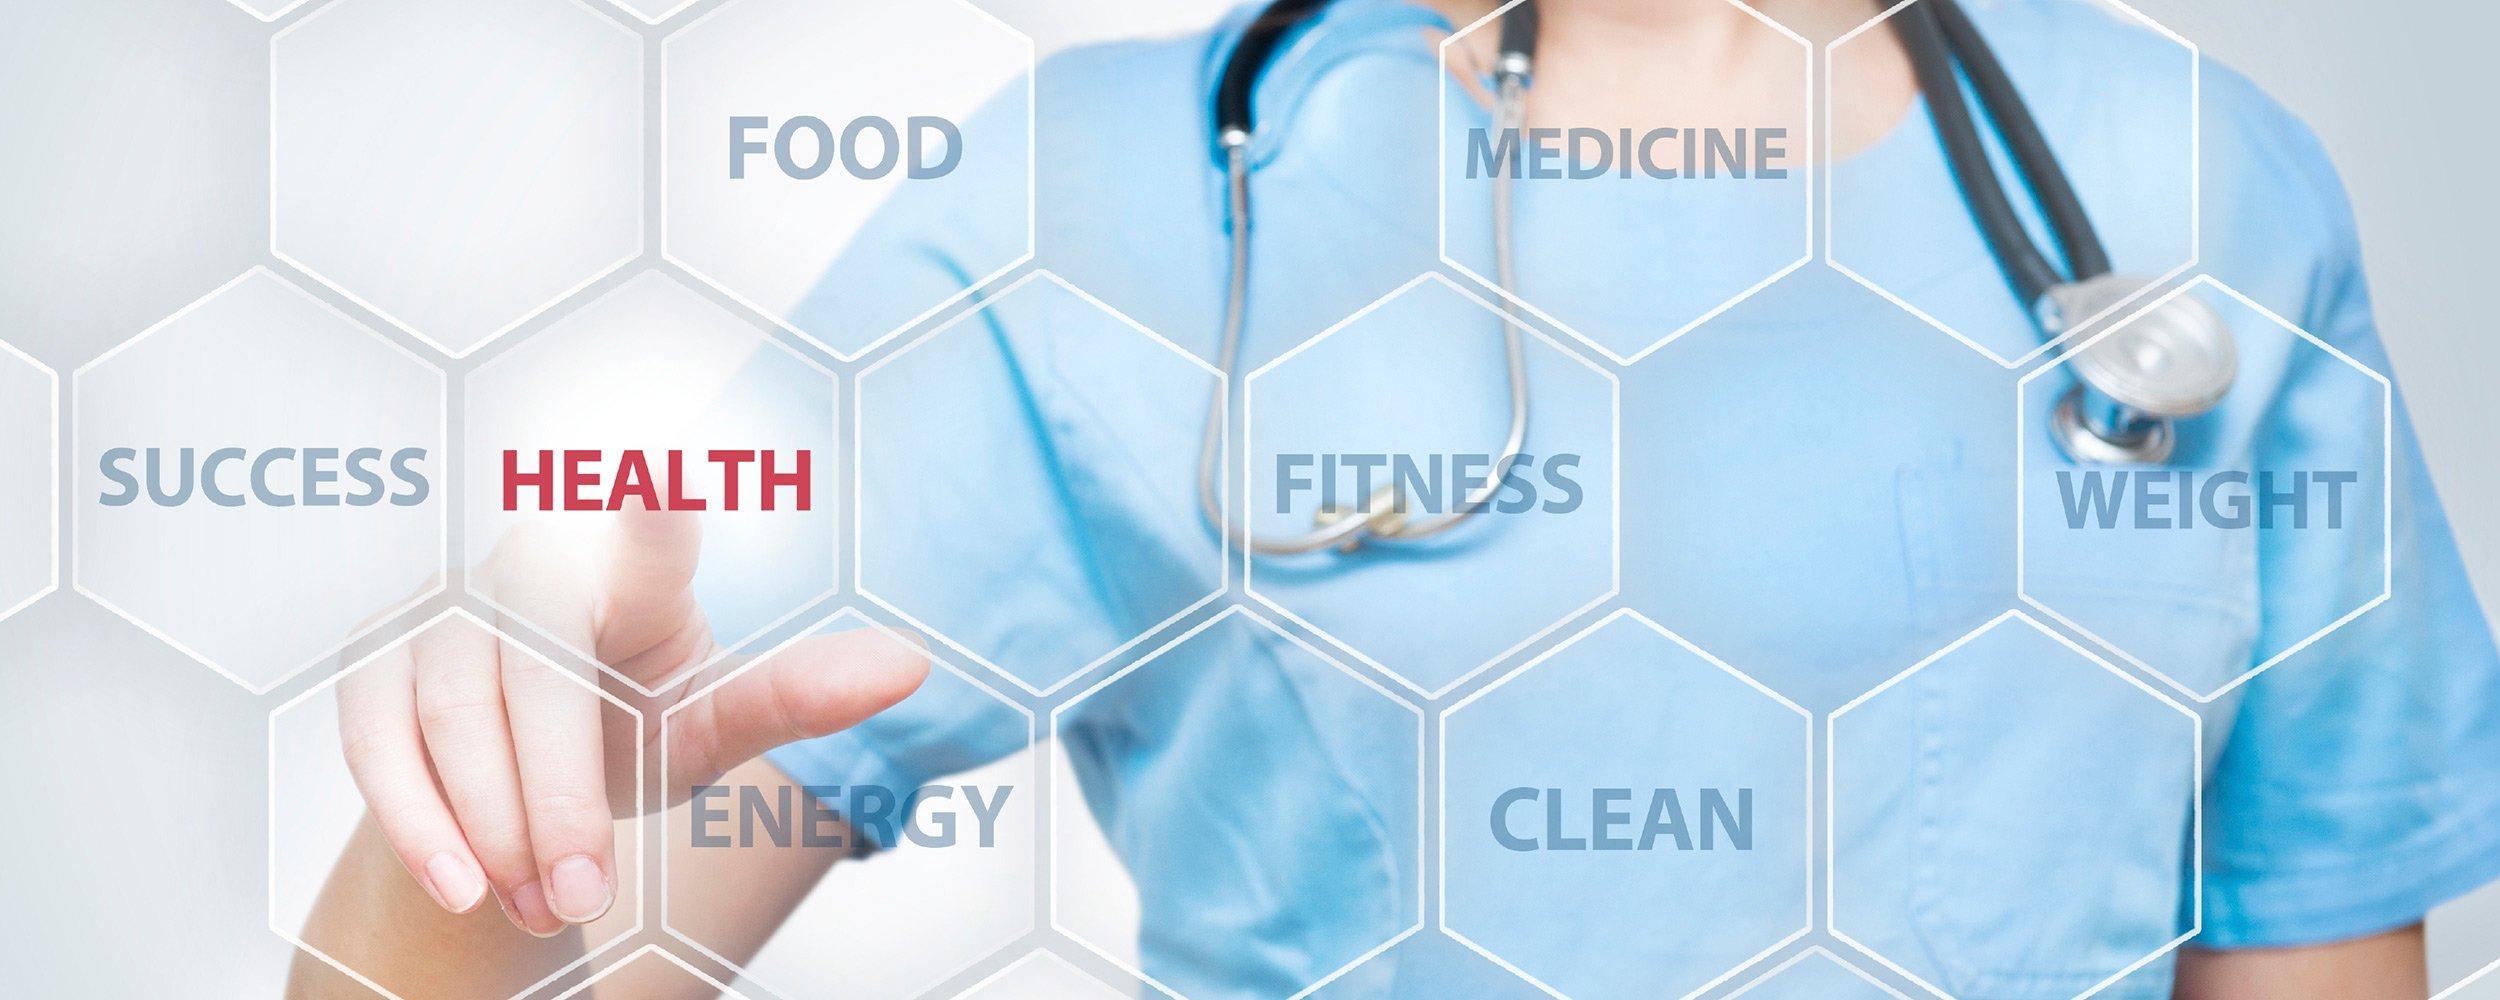 Kombination Therapie ratsam für Darmerkrankung IBS